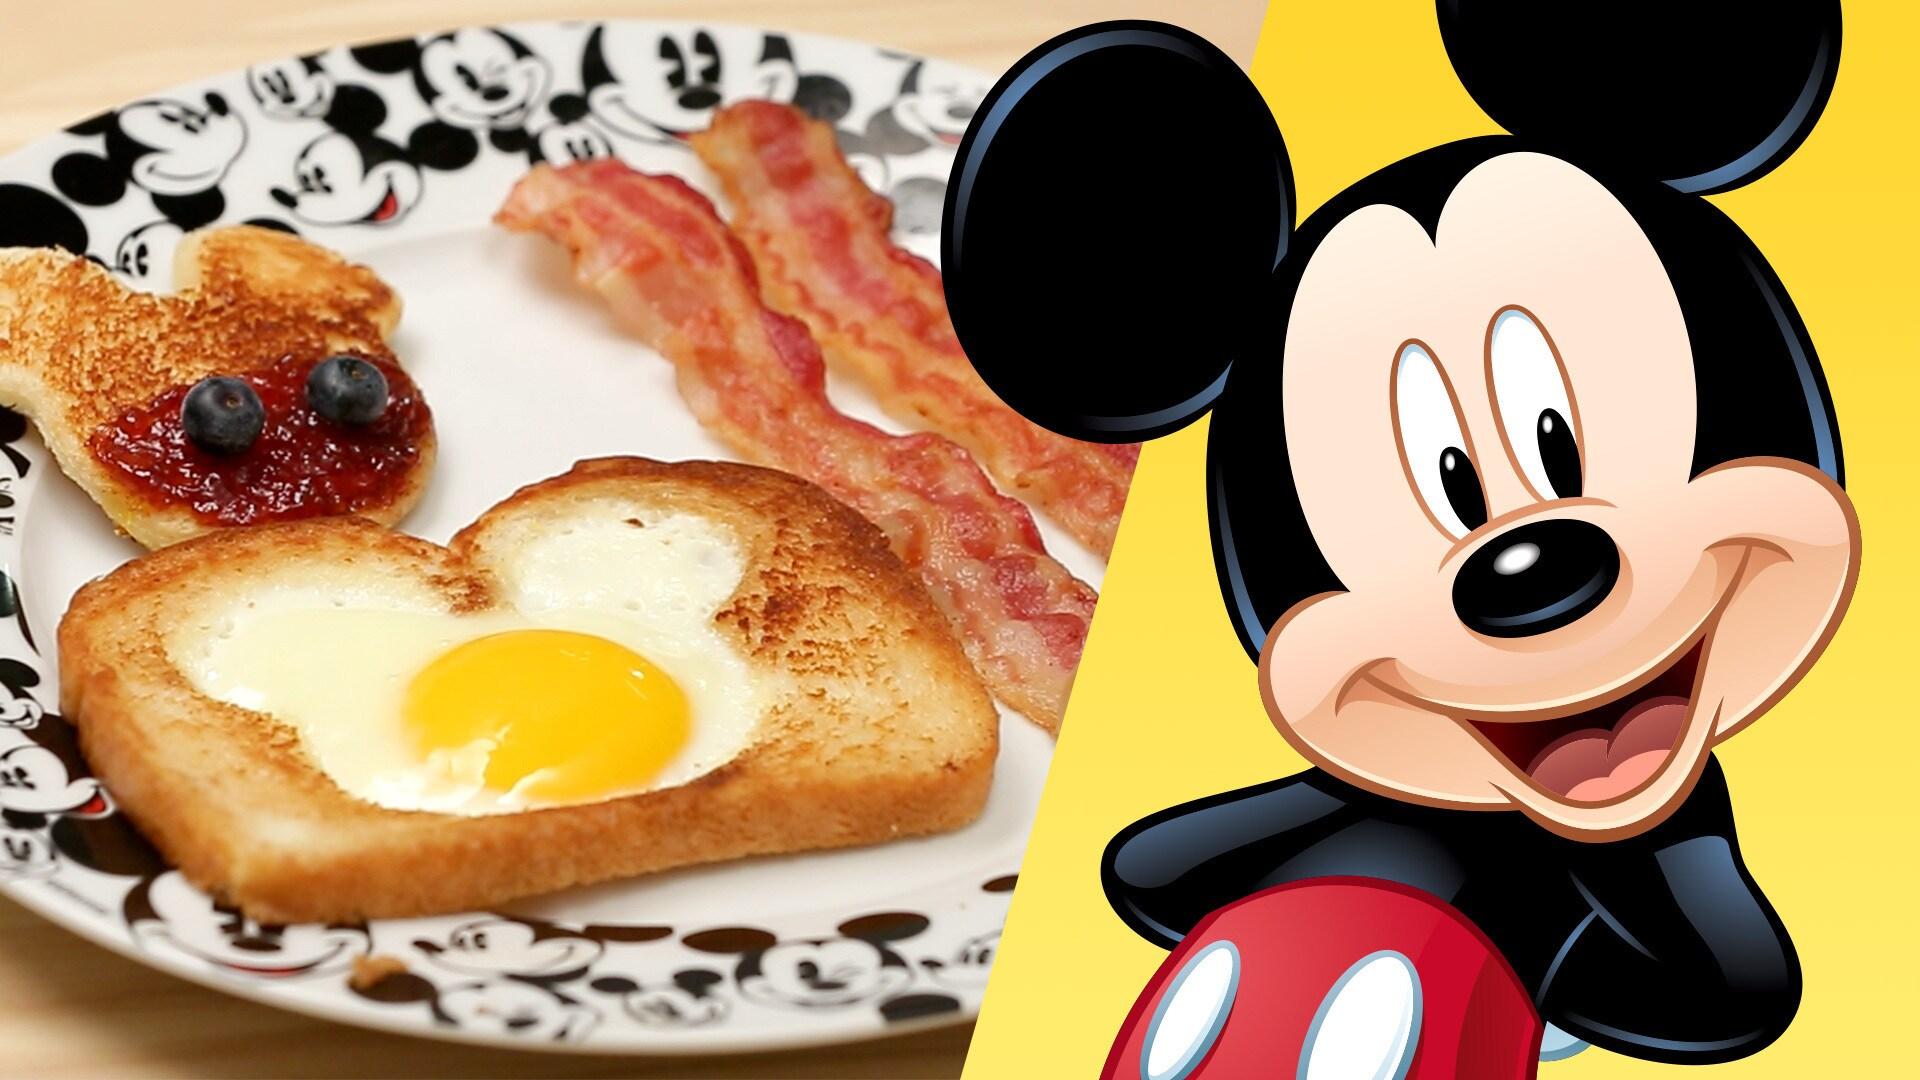 Mickey Breakfast | Dishes by Disney